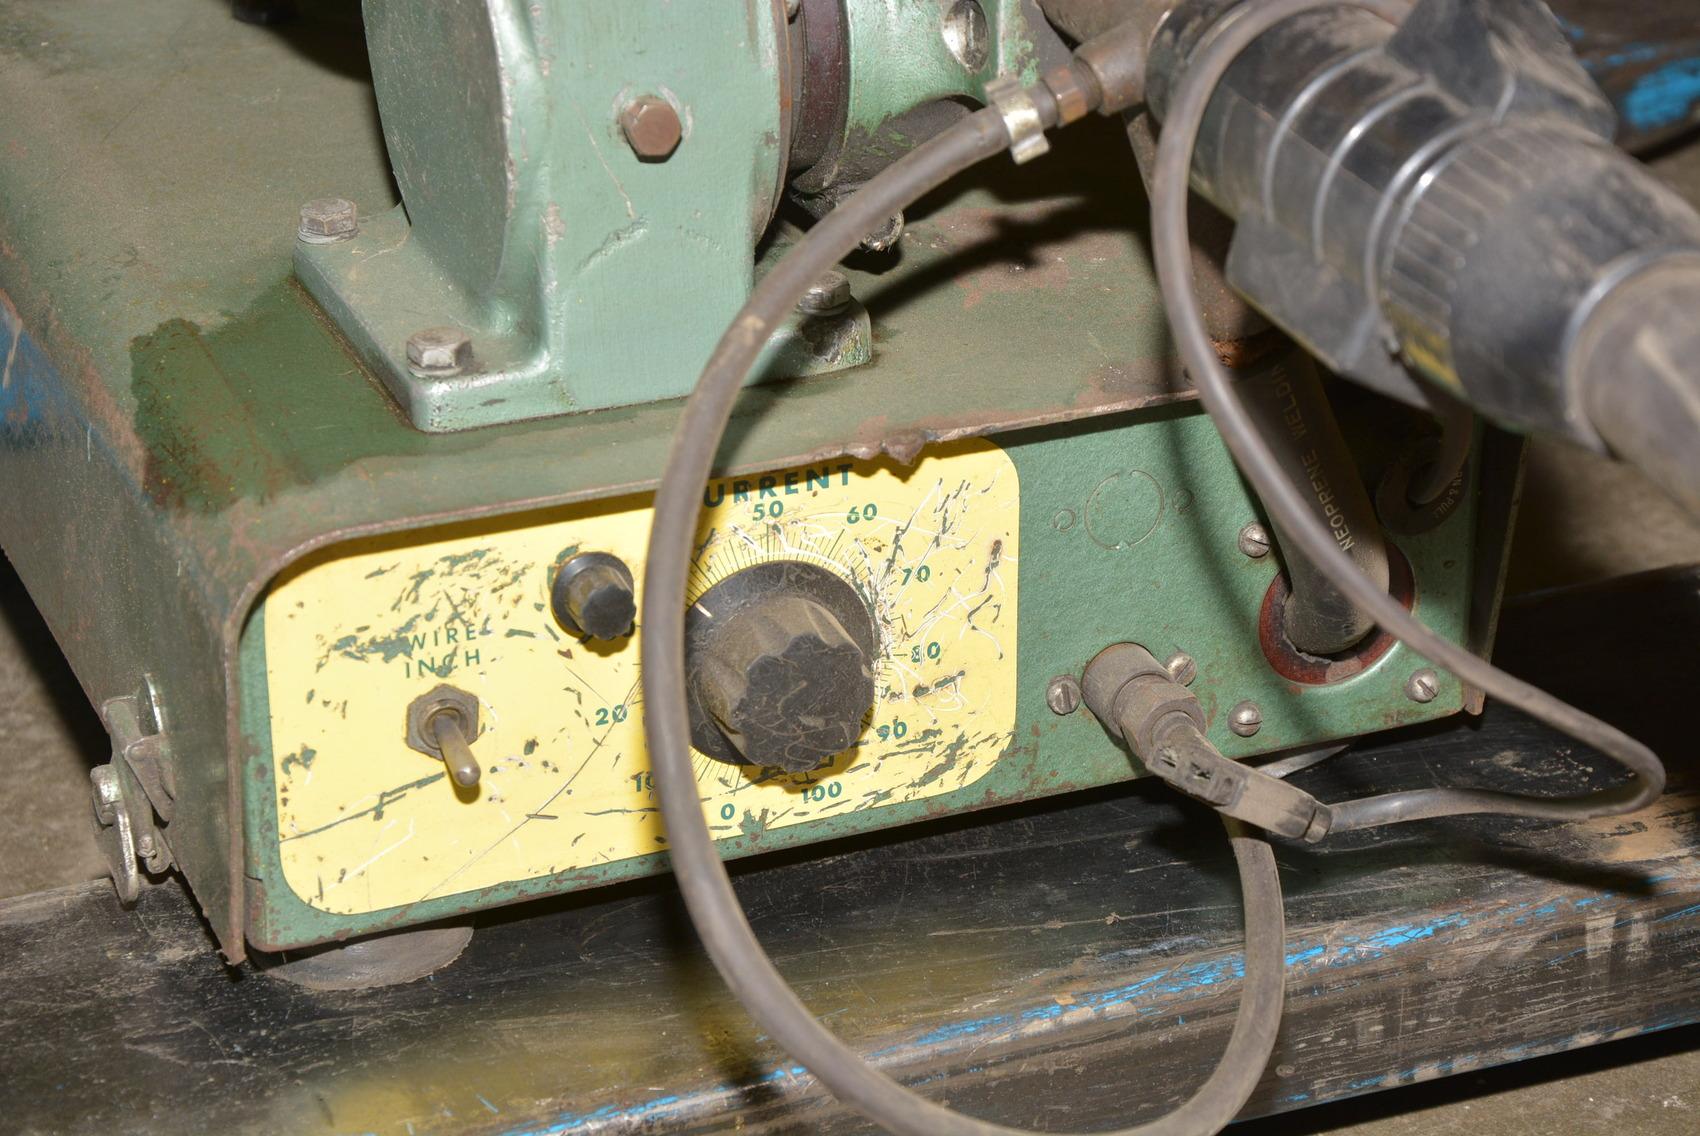 Used Mig Welders For Sale >> Linde Type SWM-23 MIG Welding Wire Feed w/Tweco Mig Gun INV=13378 | eBay